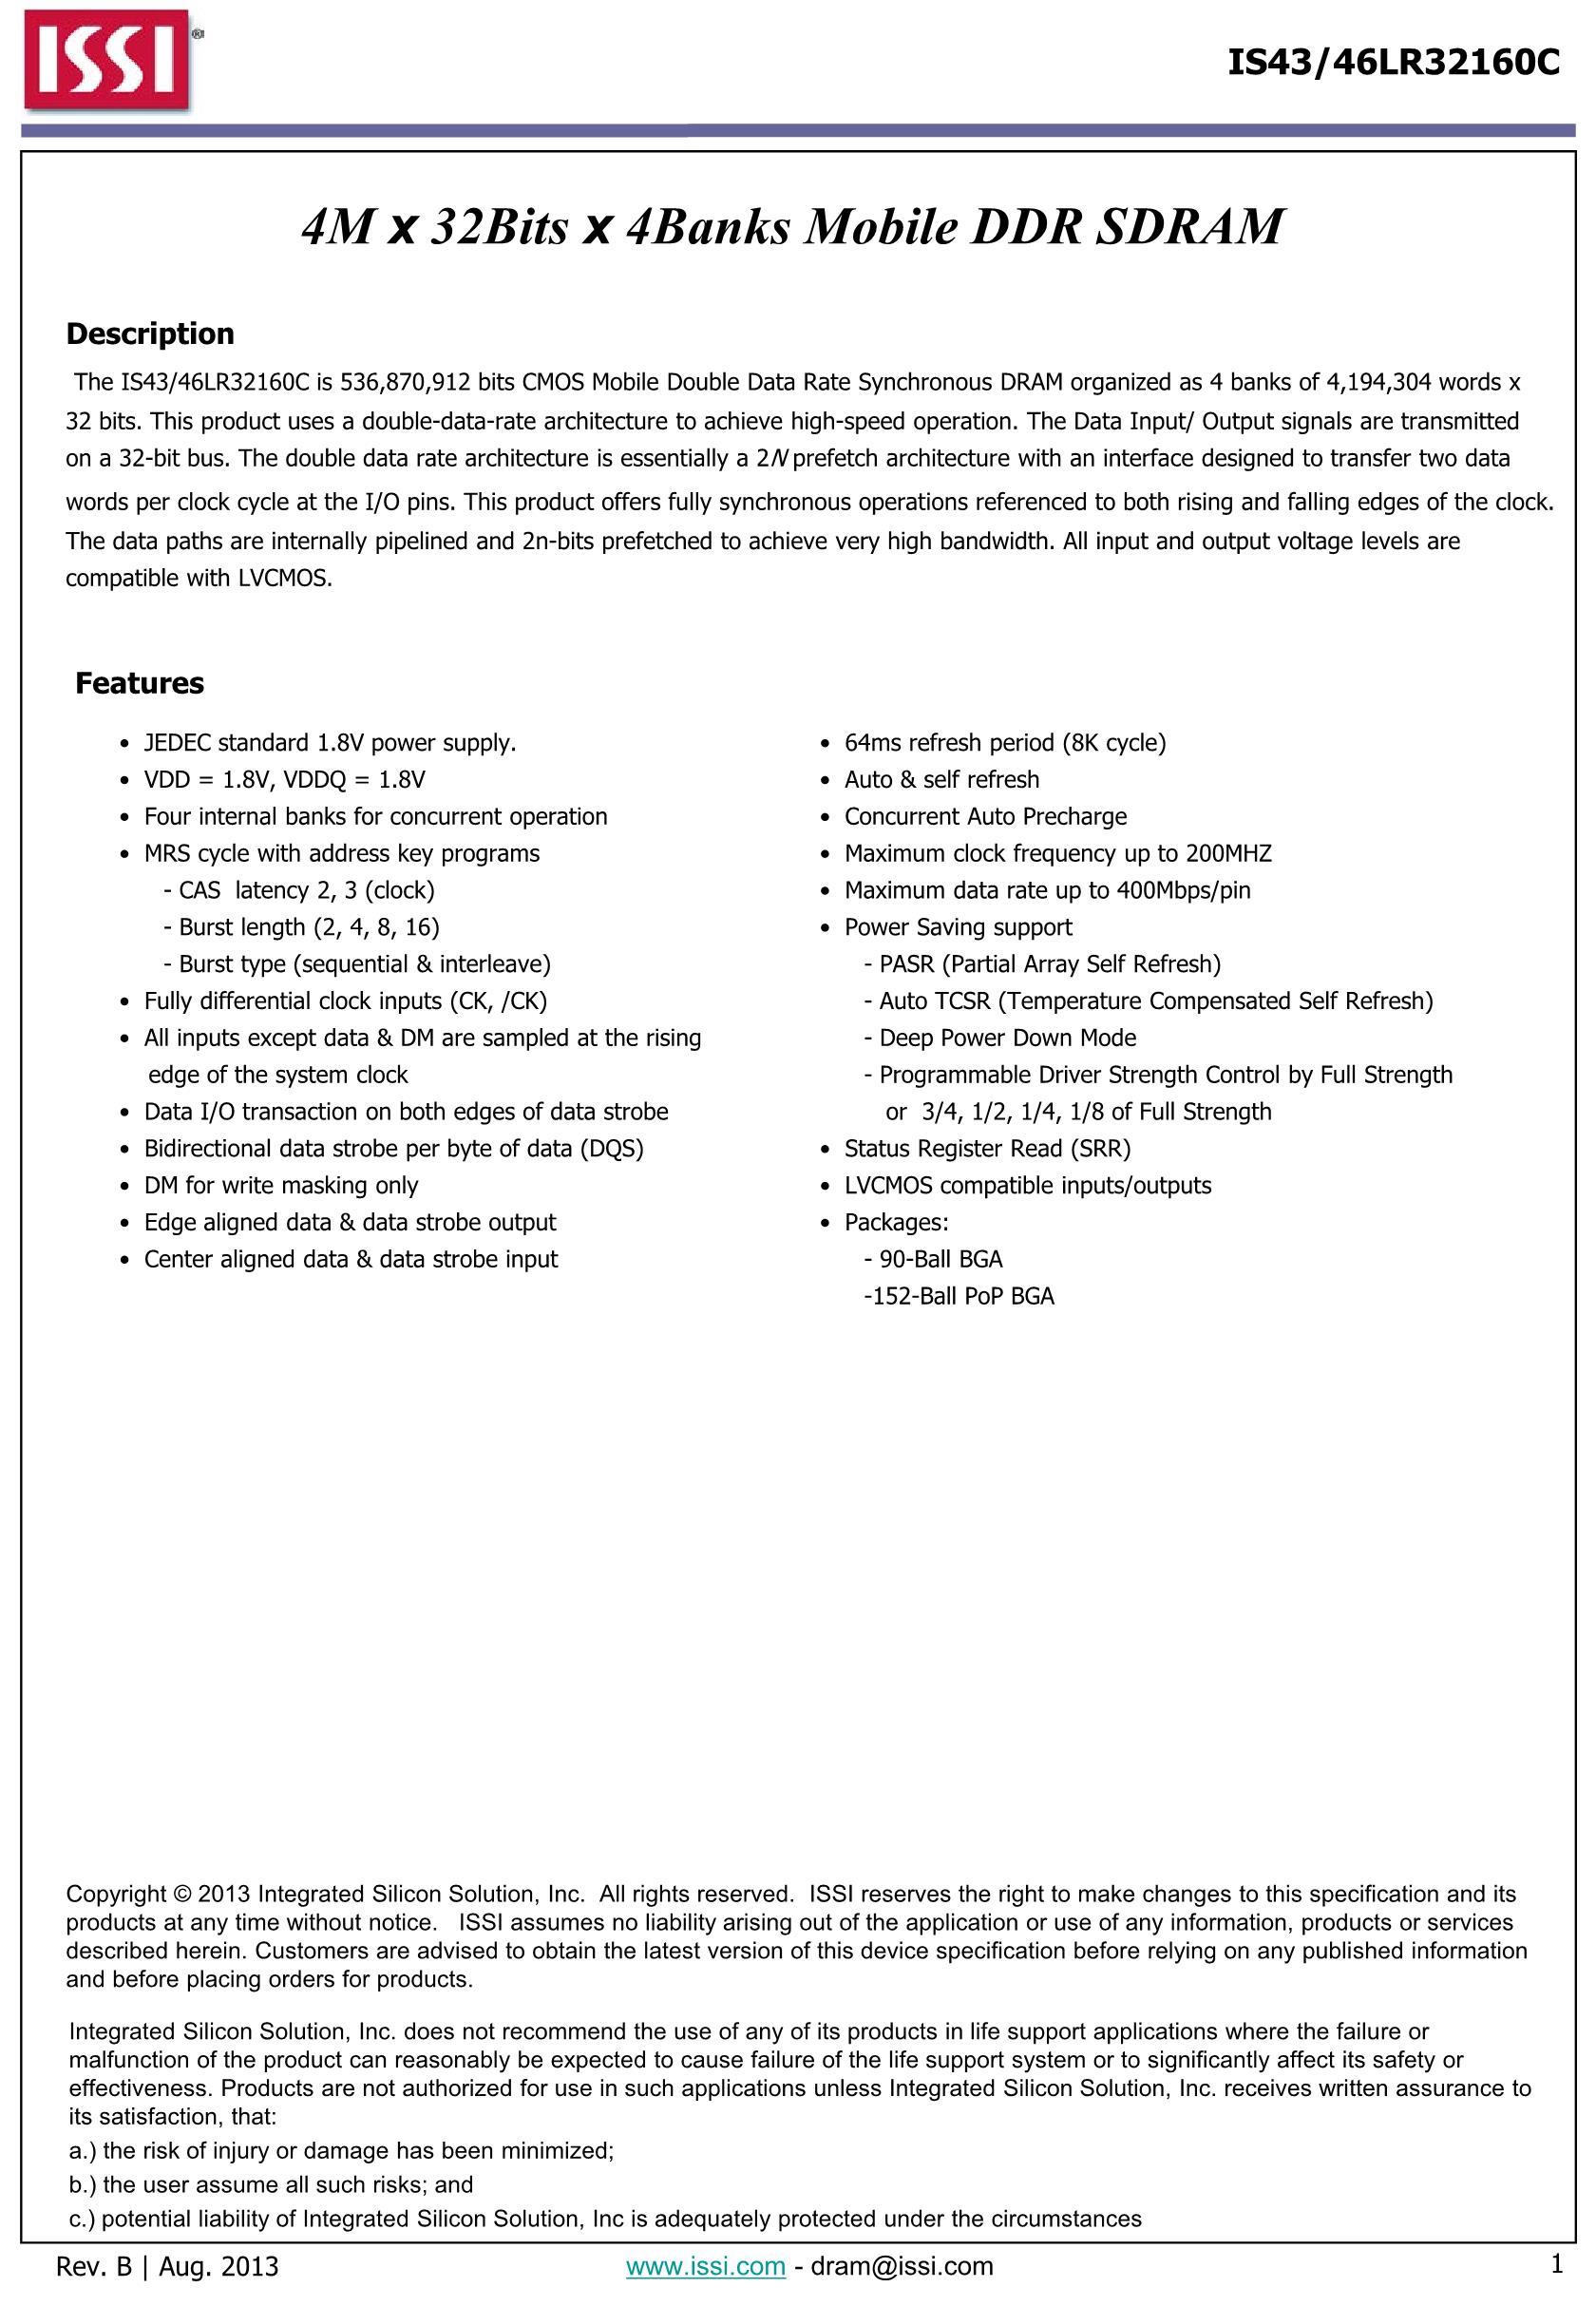 IS43DR86400-3DBLI's pdf picture 1